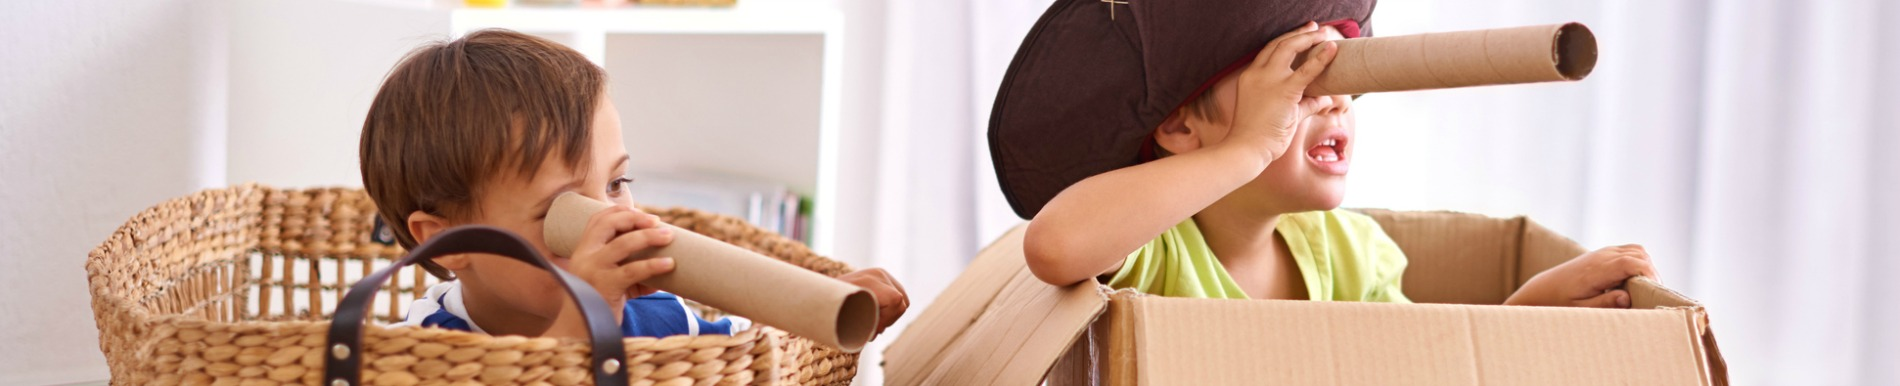 https://www.healthychildren.org/SiteCollectionImage-Homepage-Banners/power_of_play_header.jpg